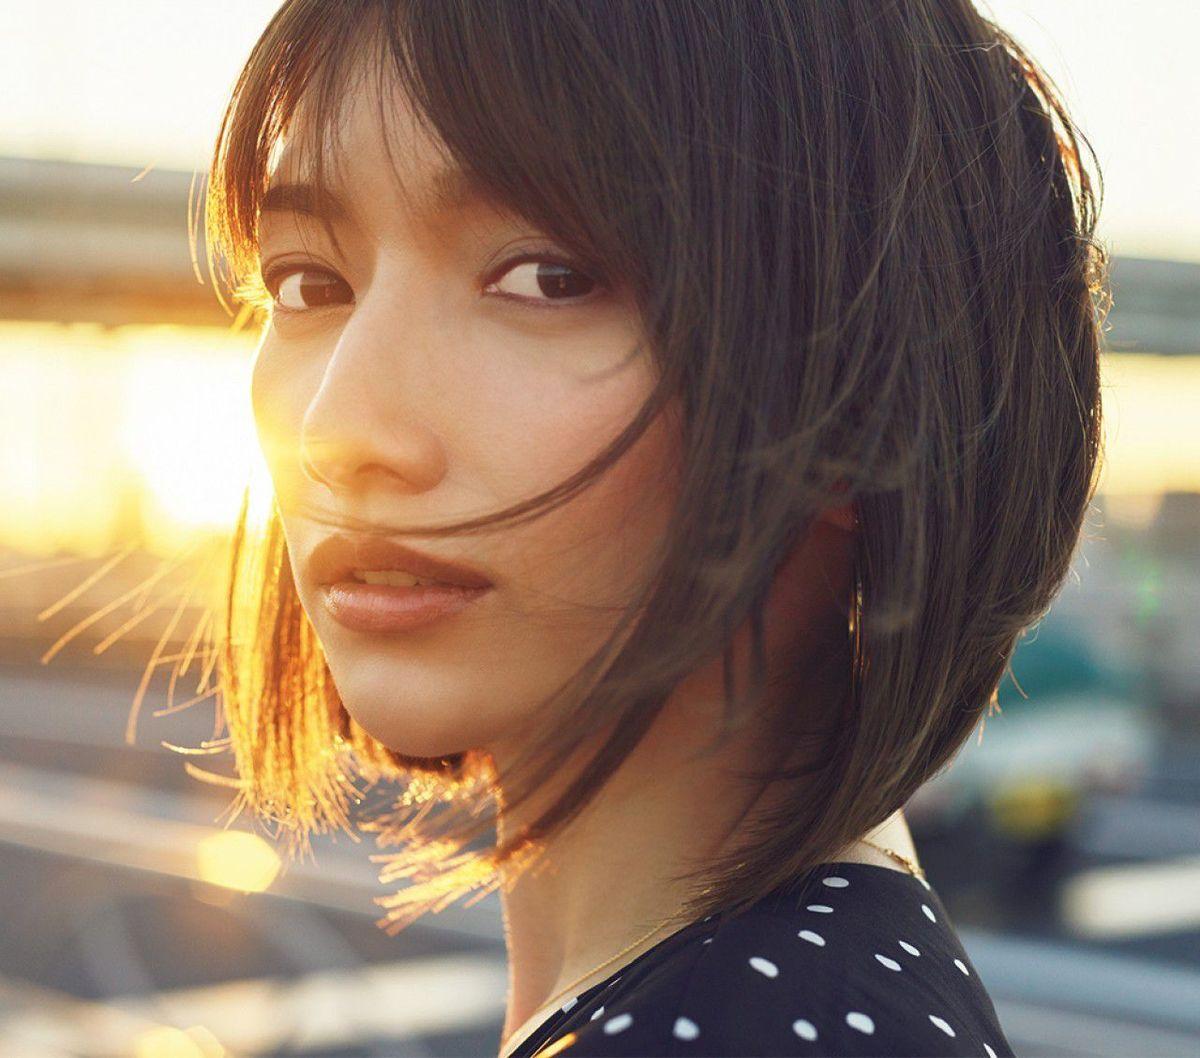 [FRIDAY] 後藤真希 《アニバーサリー 最新カット特別公開!》写真1